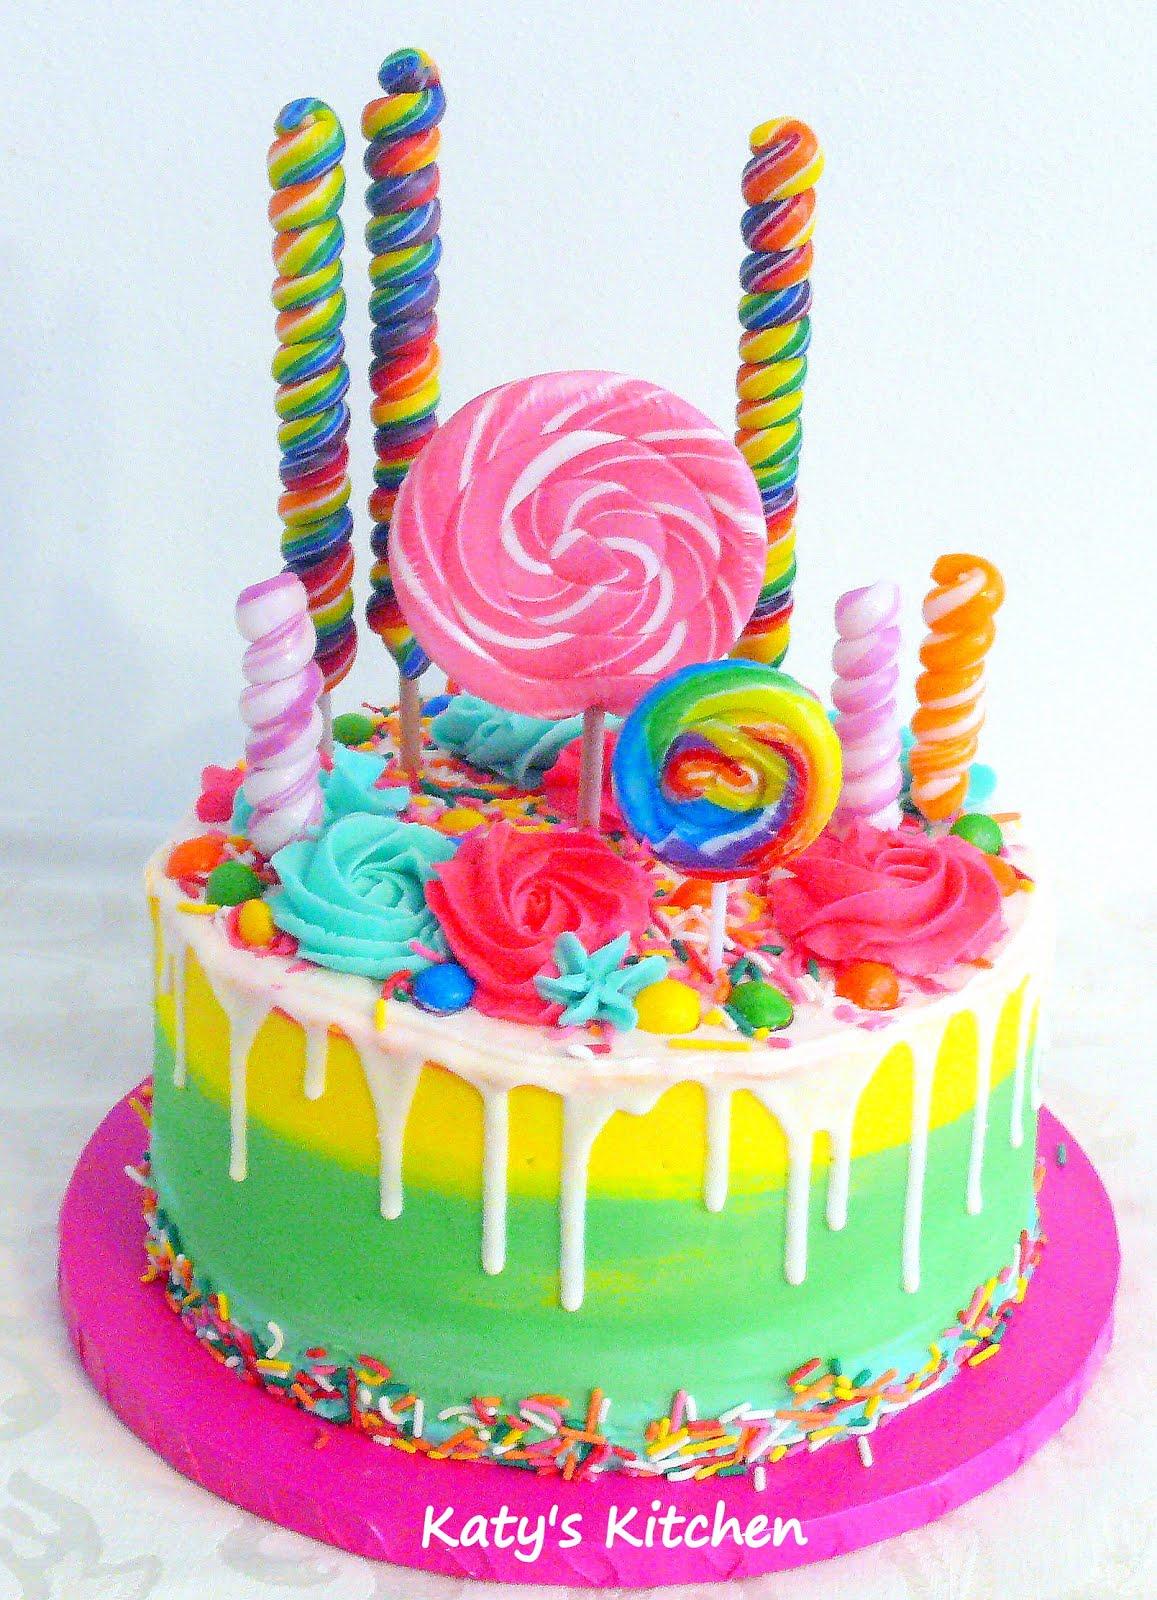 Remarkable Katys Kitchen Lollipop Candy Drip Cake Birthday Cards Printable Inklcafe Filternl